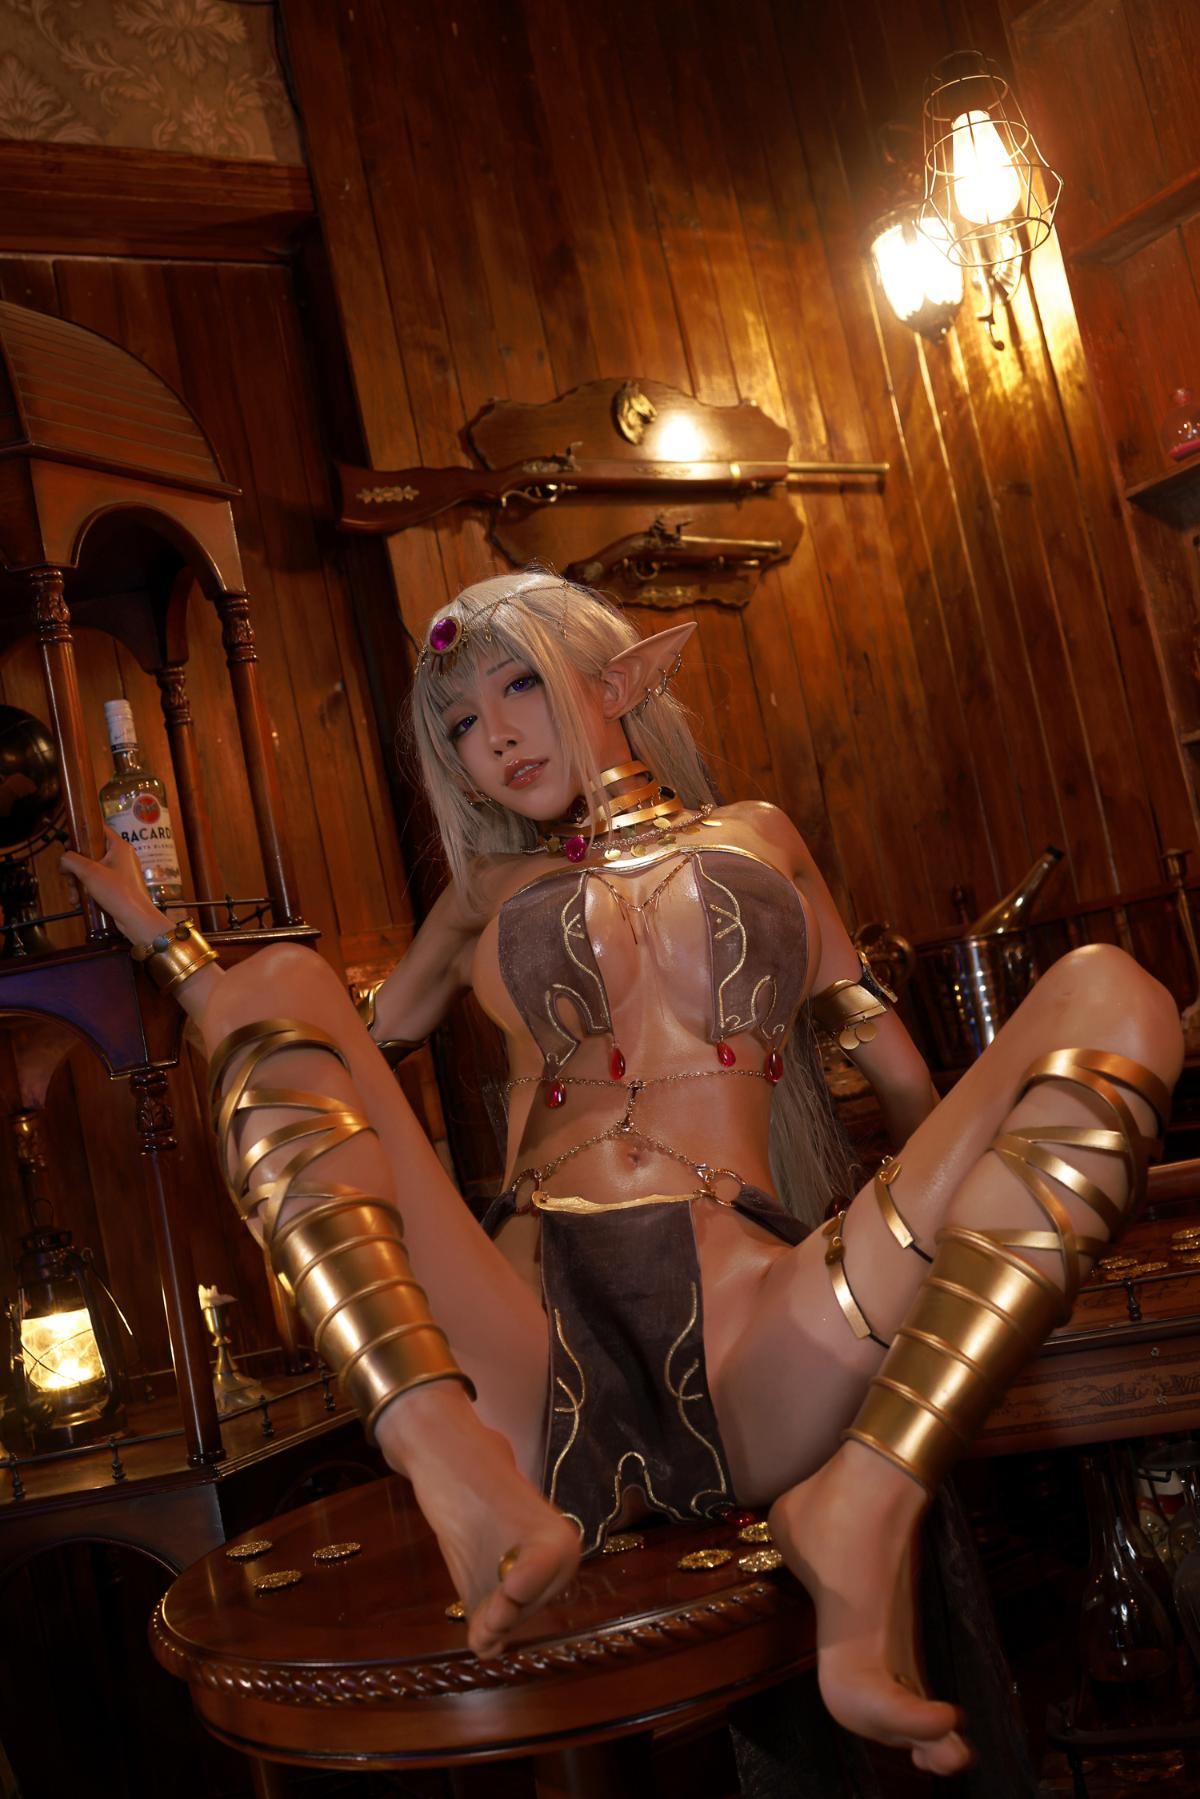 Tan Dancer Elf Succubus Cosplay by Aqua 25